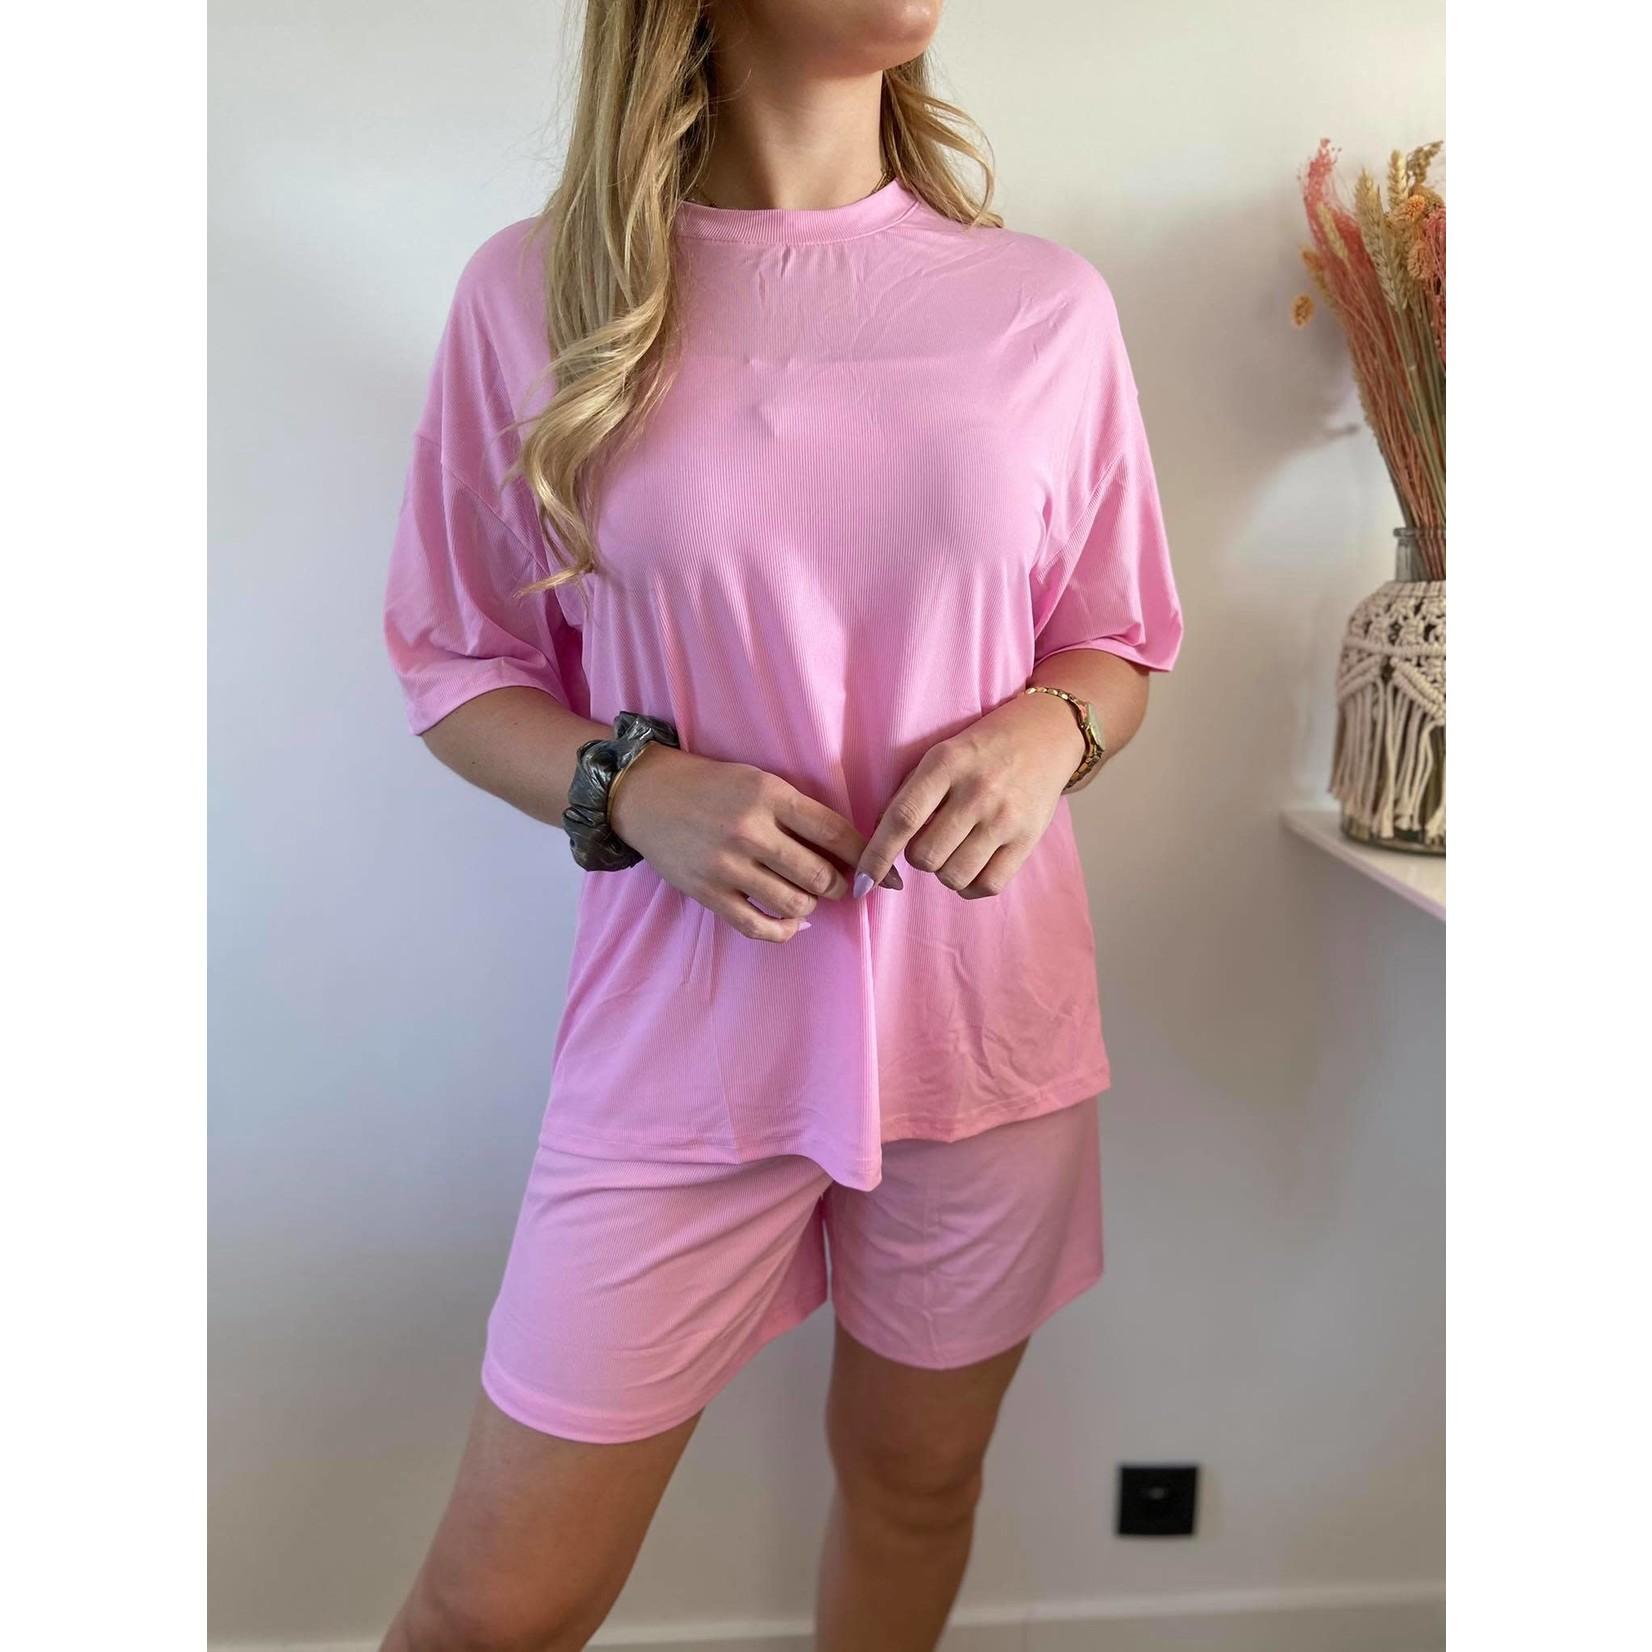 Sweetdream set pink